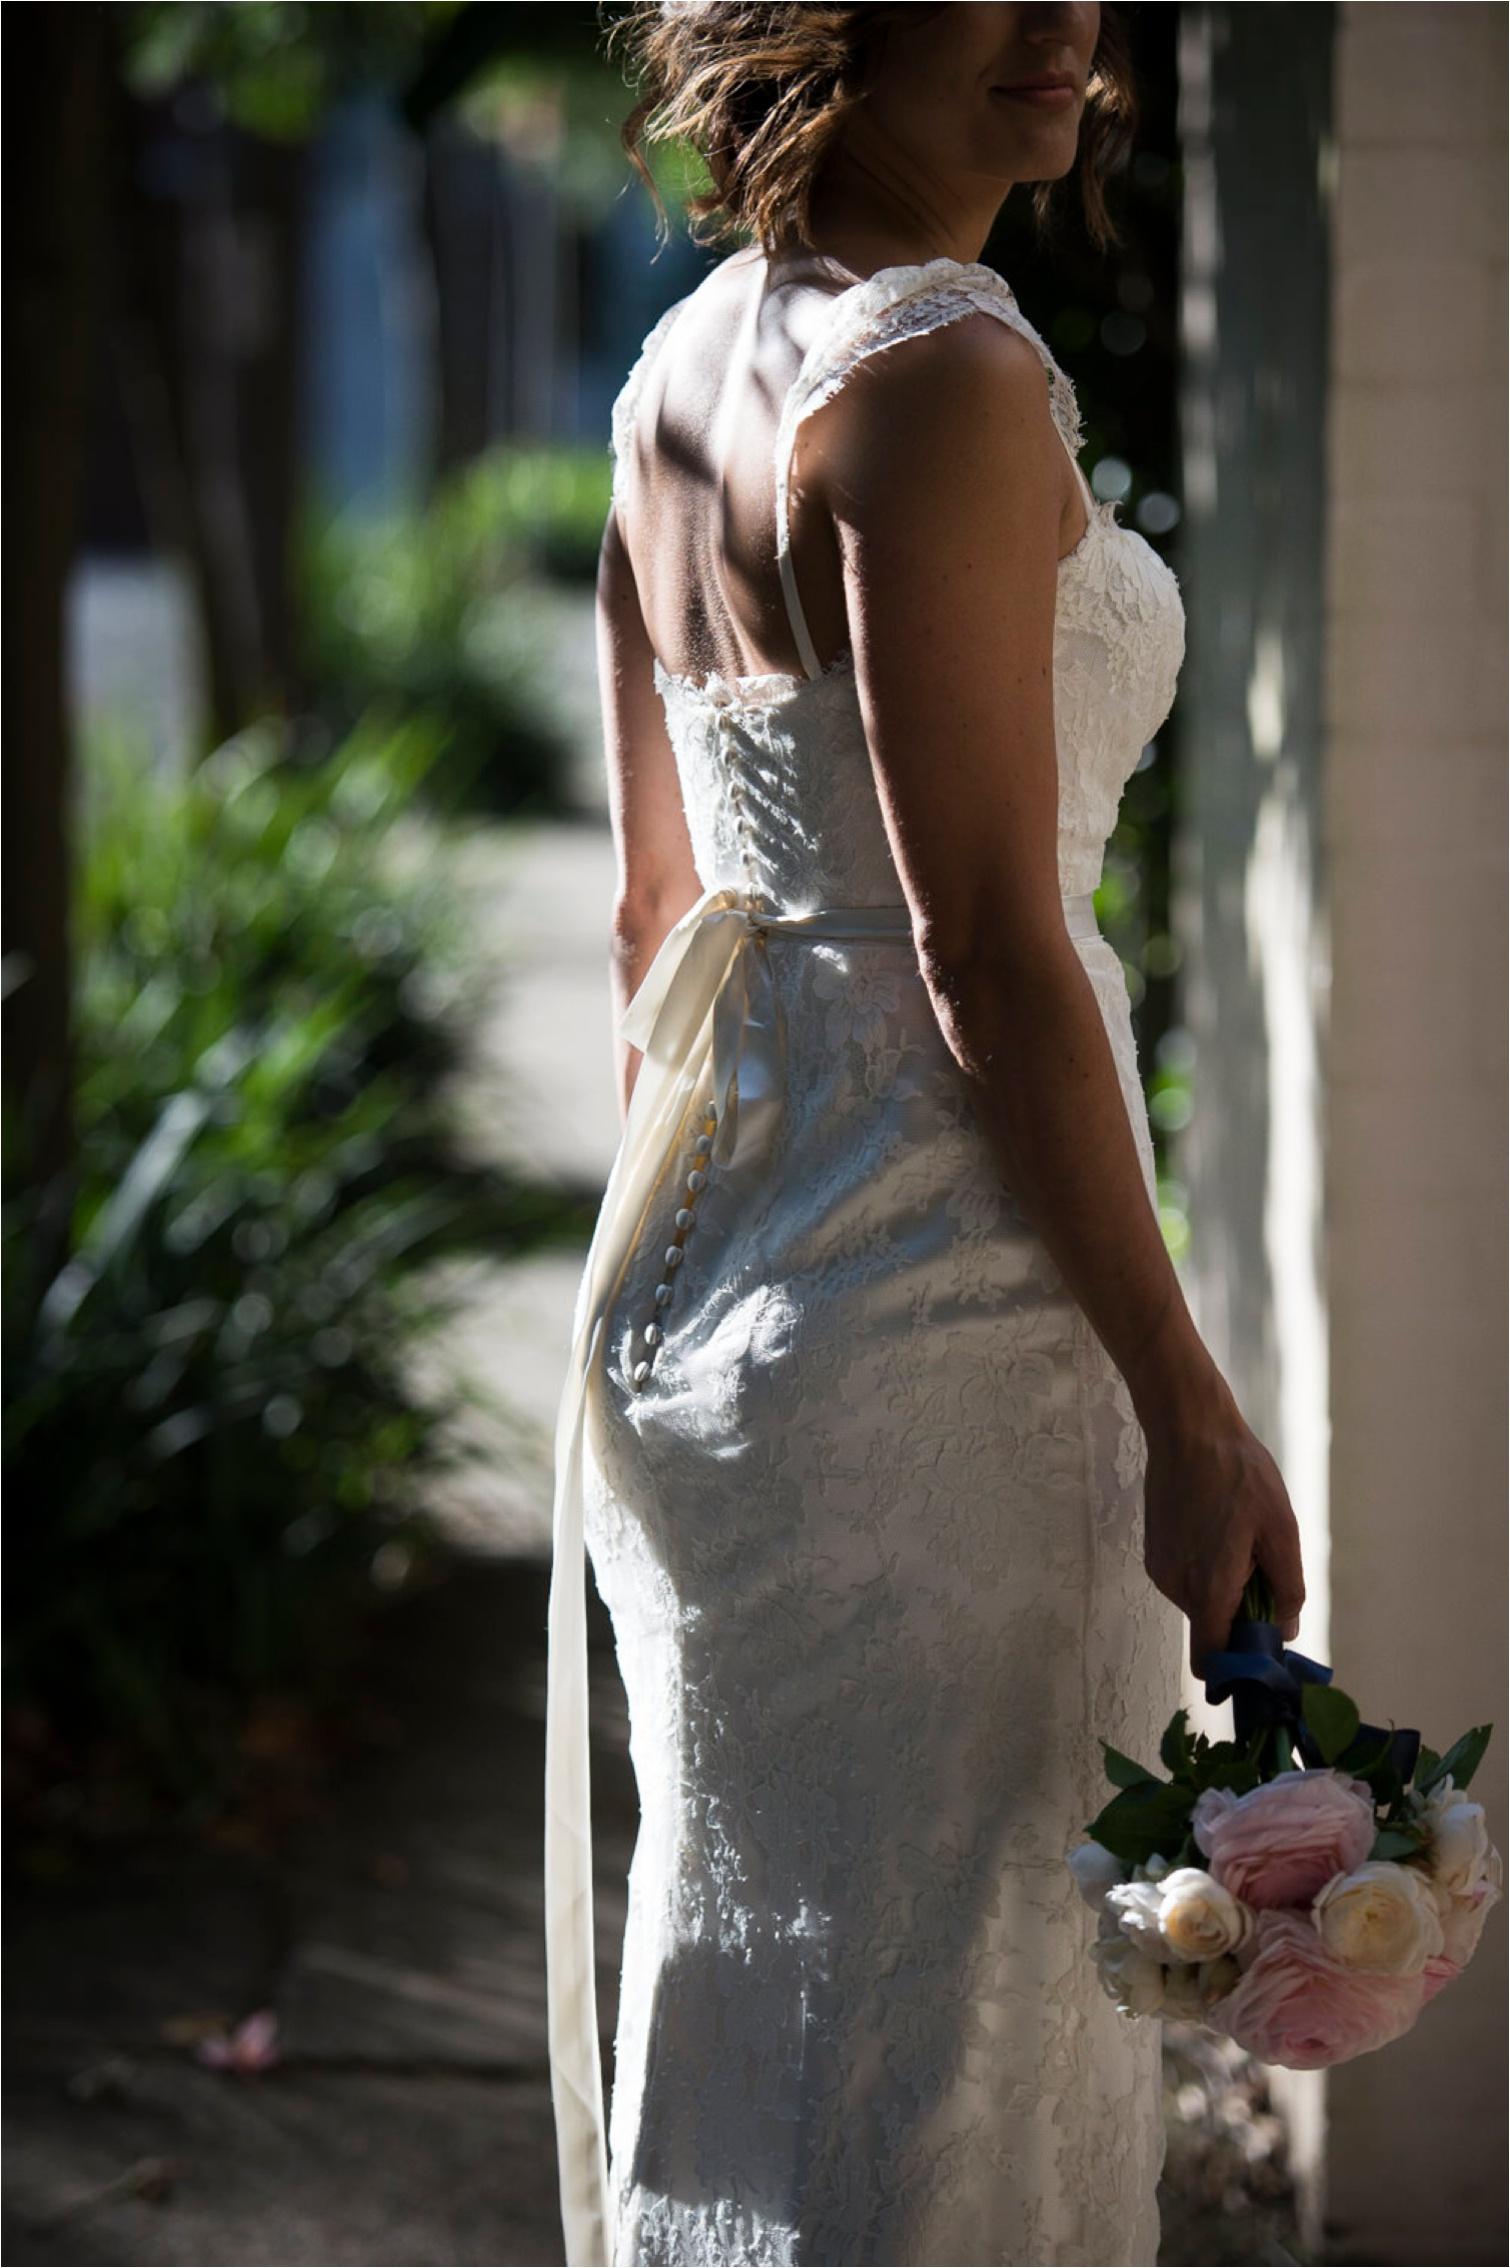 Nicole&Carlie_Watsons_Bay_Hotel_Wedding_by_Gold_Coast_Photographers-The_Follans35.jpg